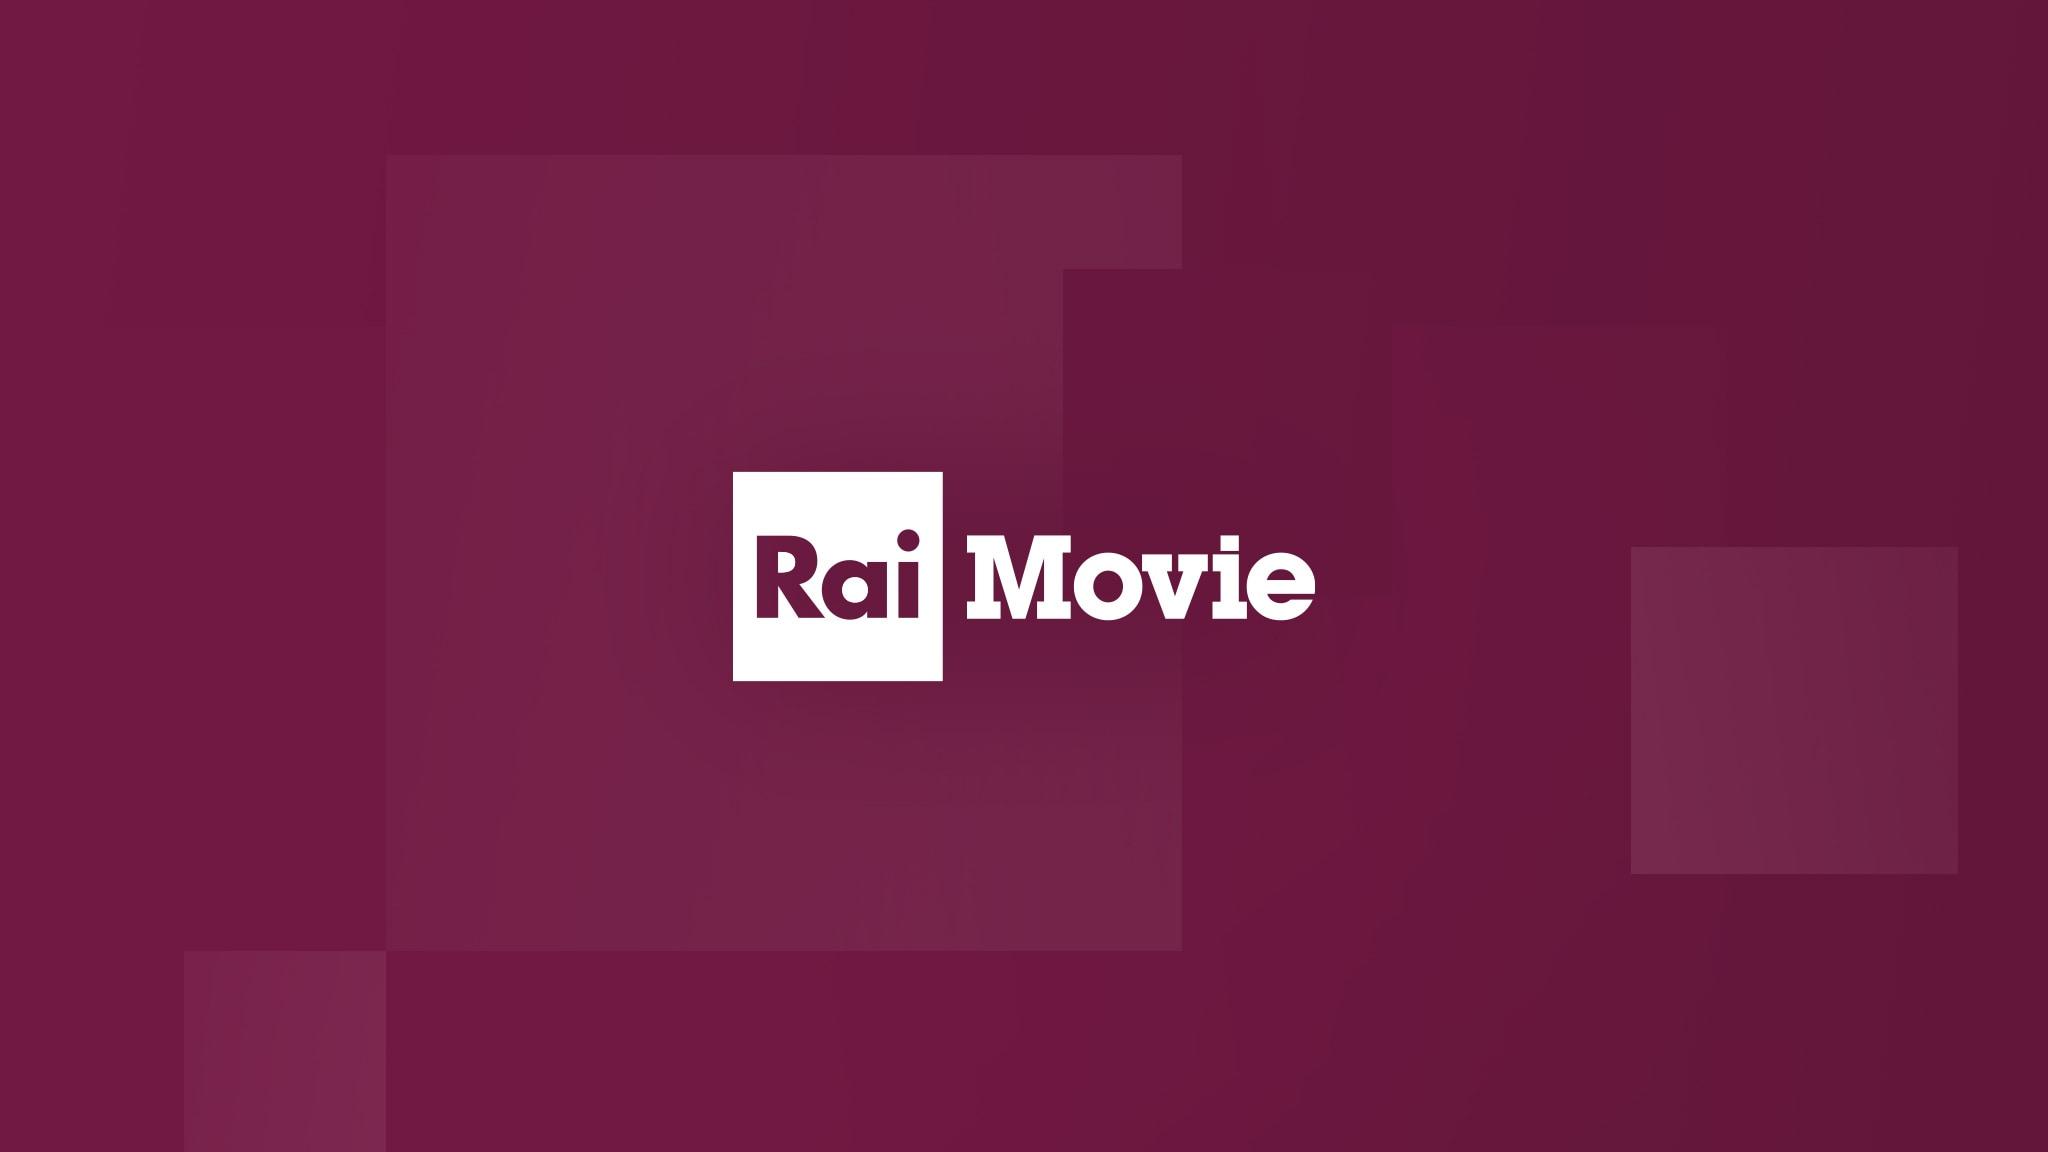 Rai Movie The Lady in the Van